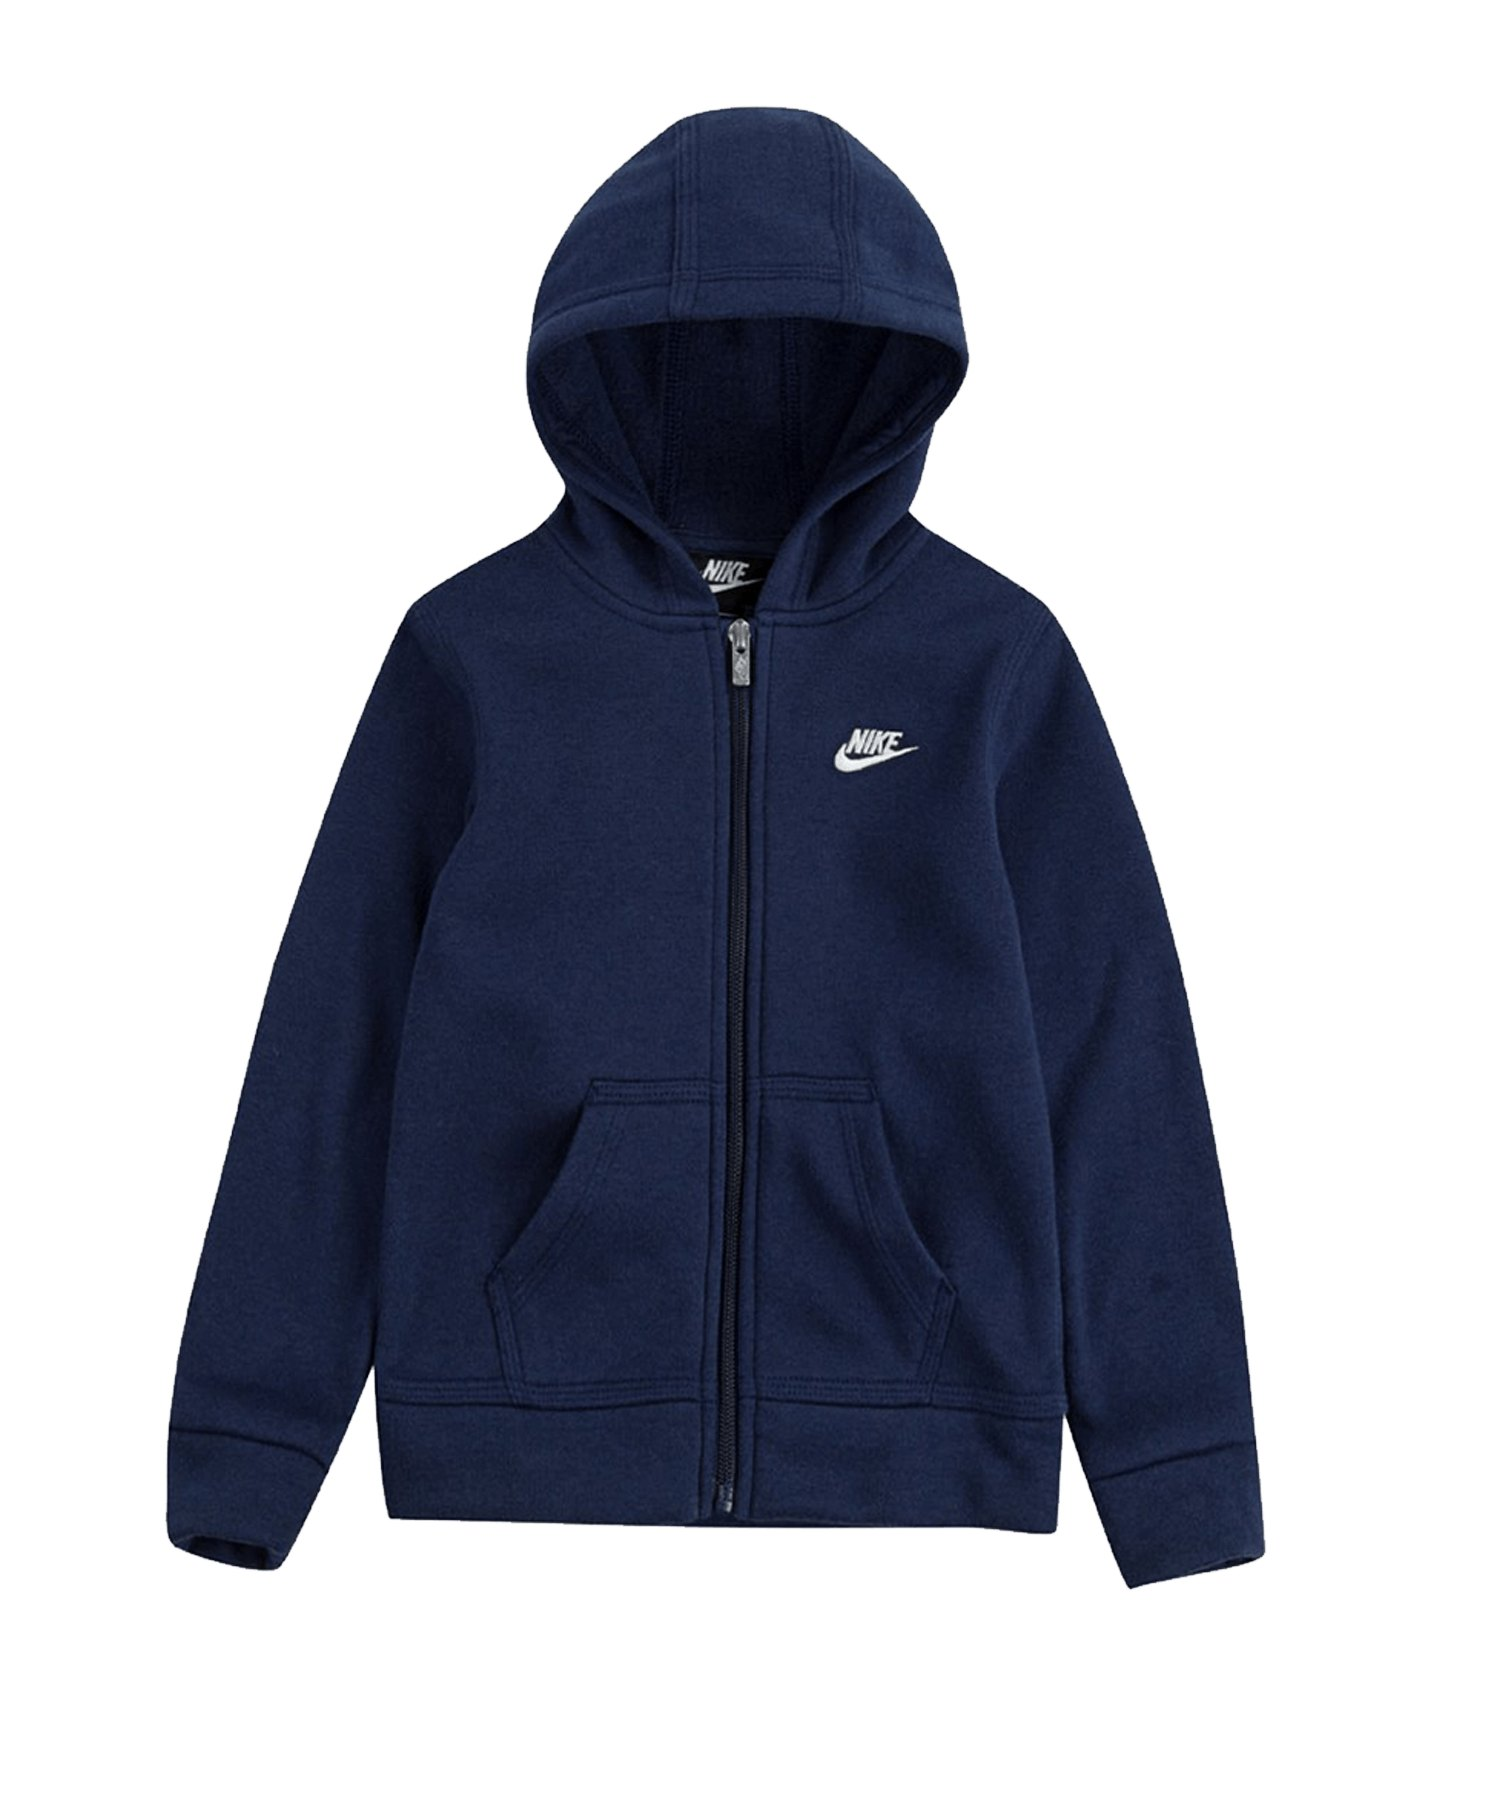 Nike Club Fleece Kapuzenjacke Kids Blau FU90 - blau